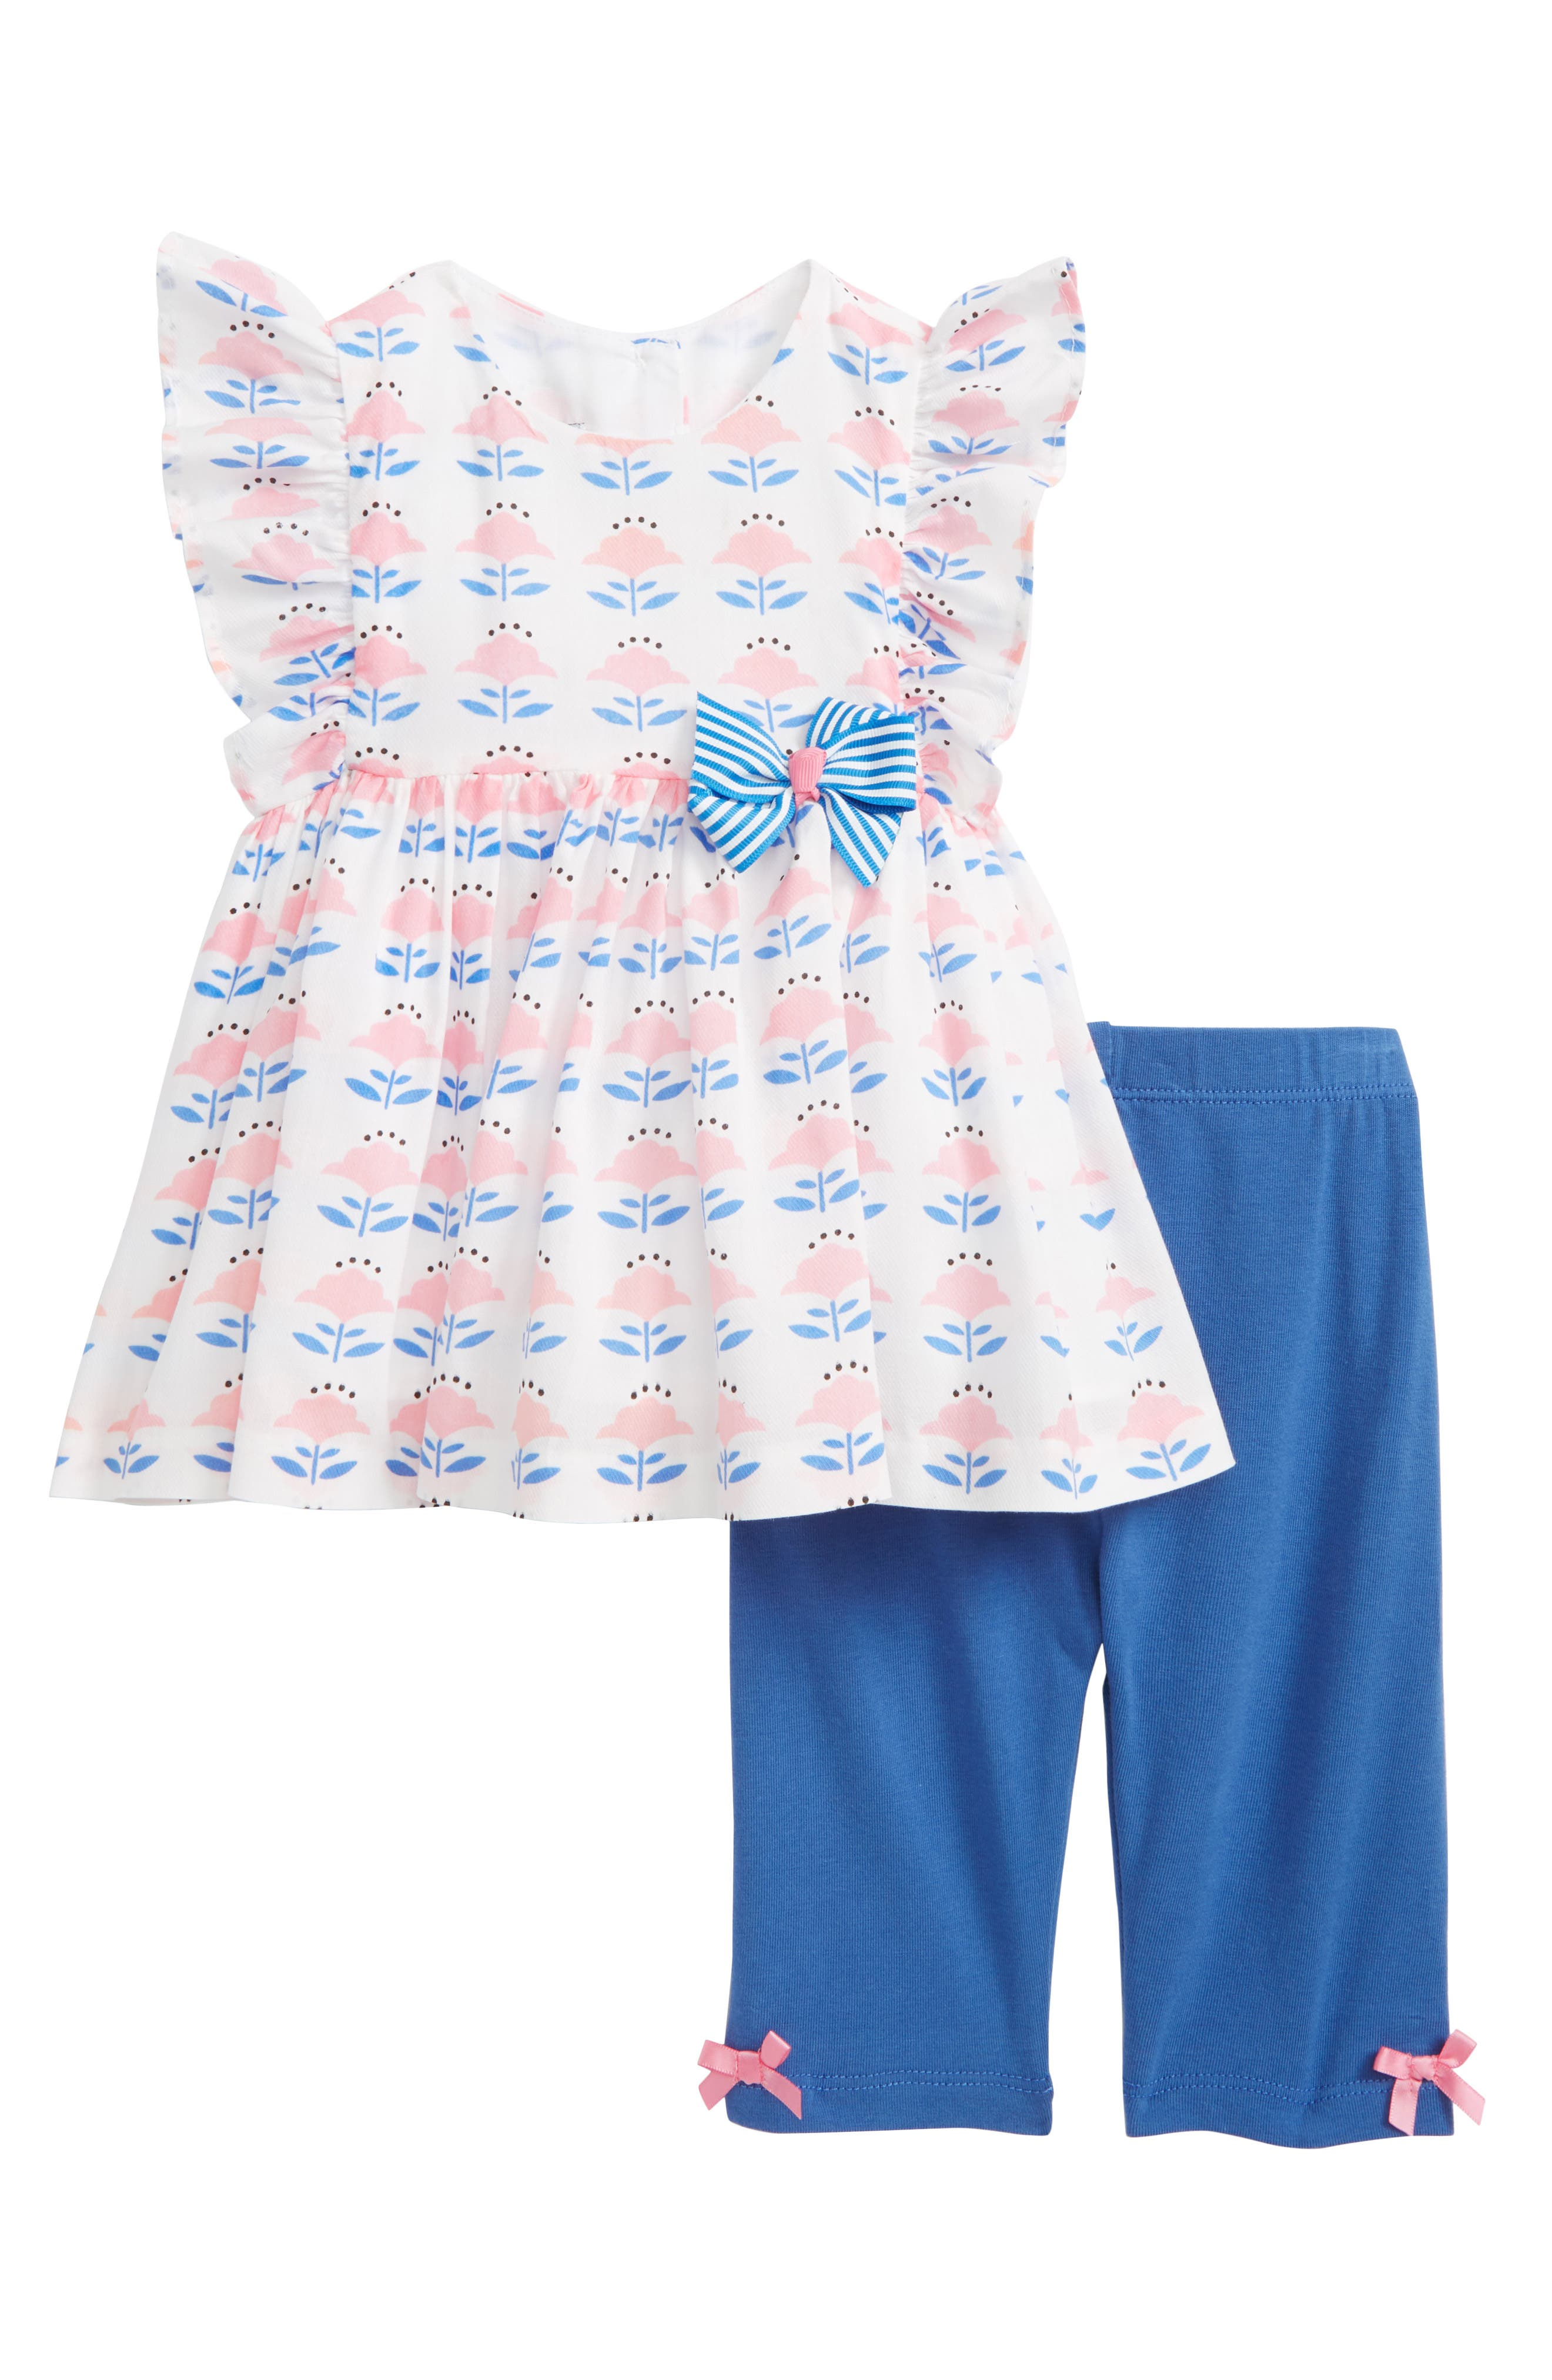 Flutter Sleeve Top & Leggings Set,                             Main thumbnail 1, color,                             White/ Pink